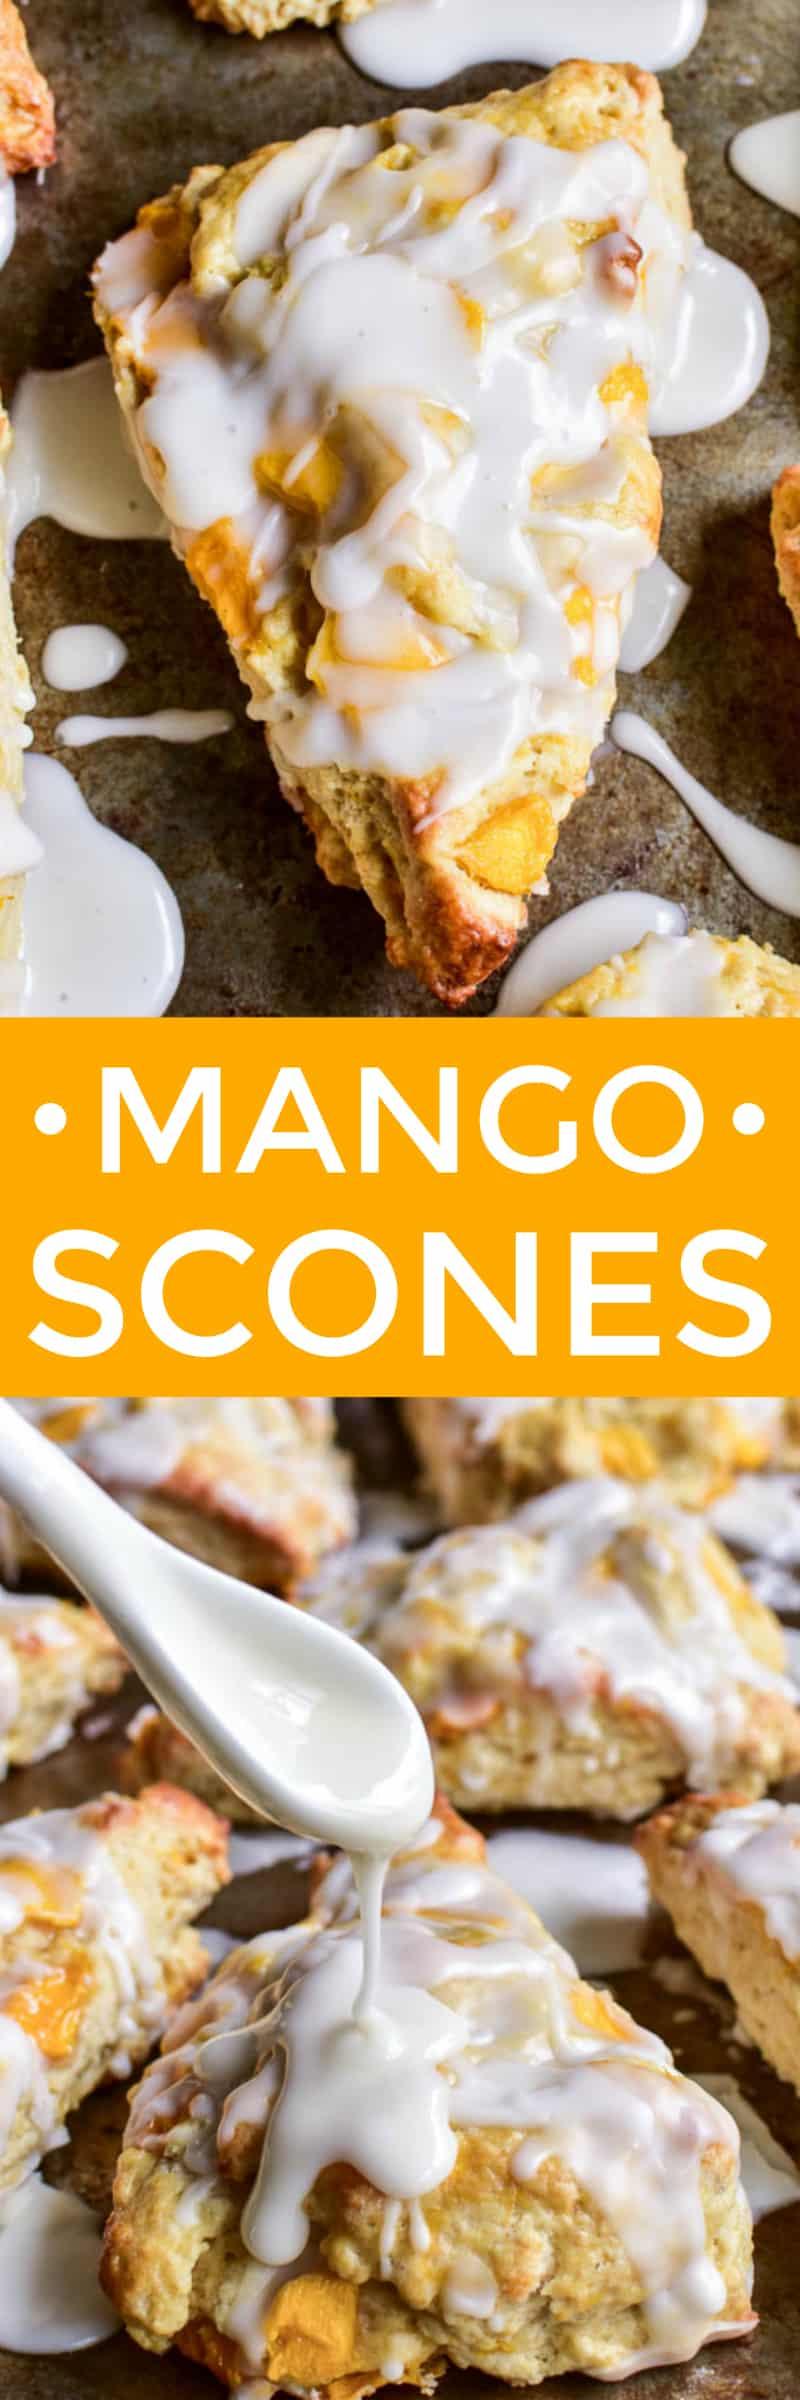 Collage image of Mango Scones with vanilla glaze